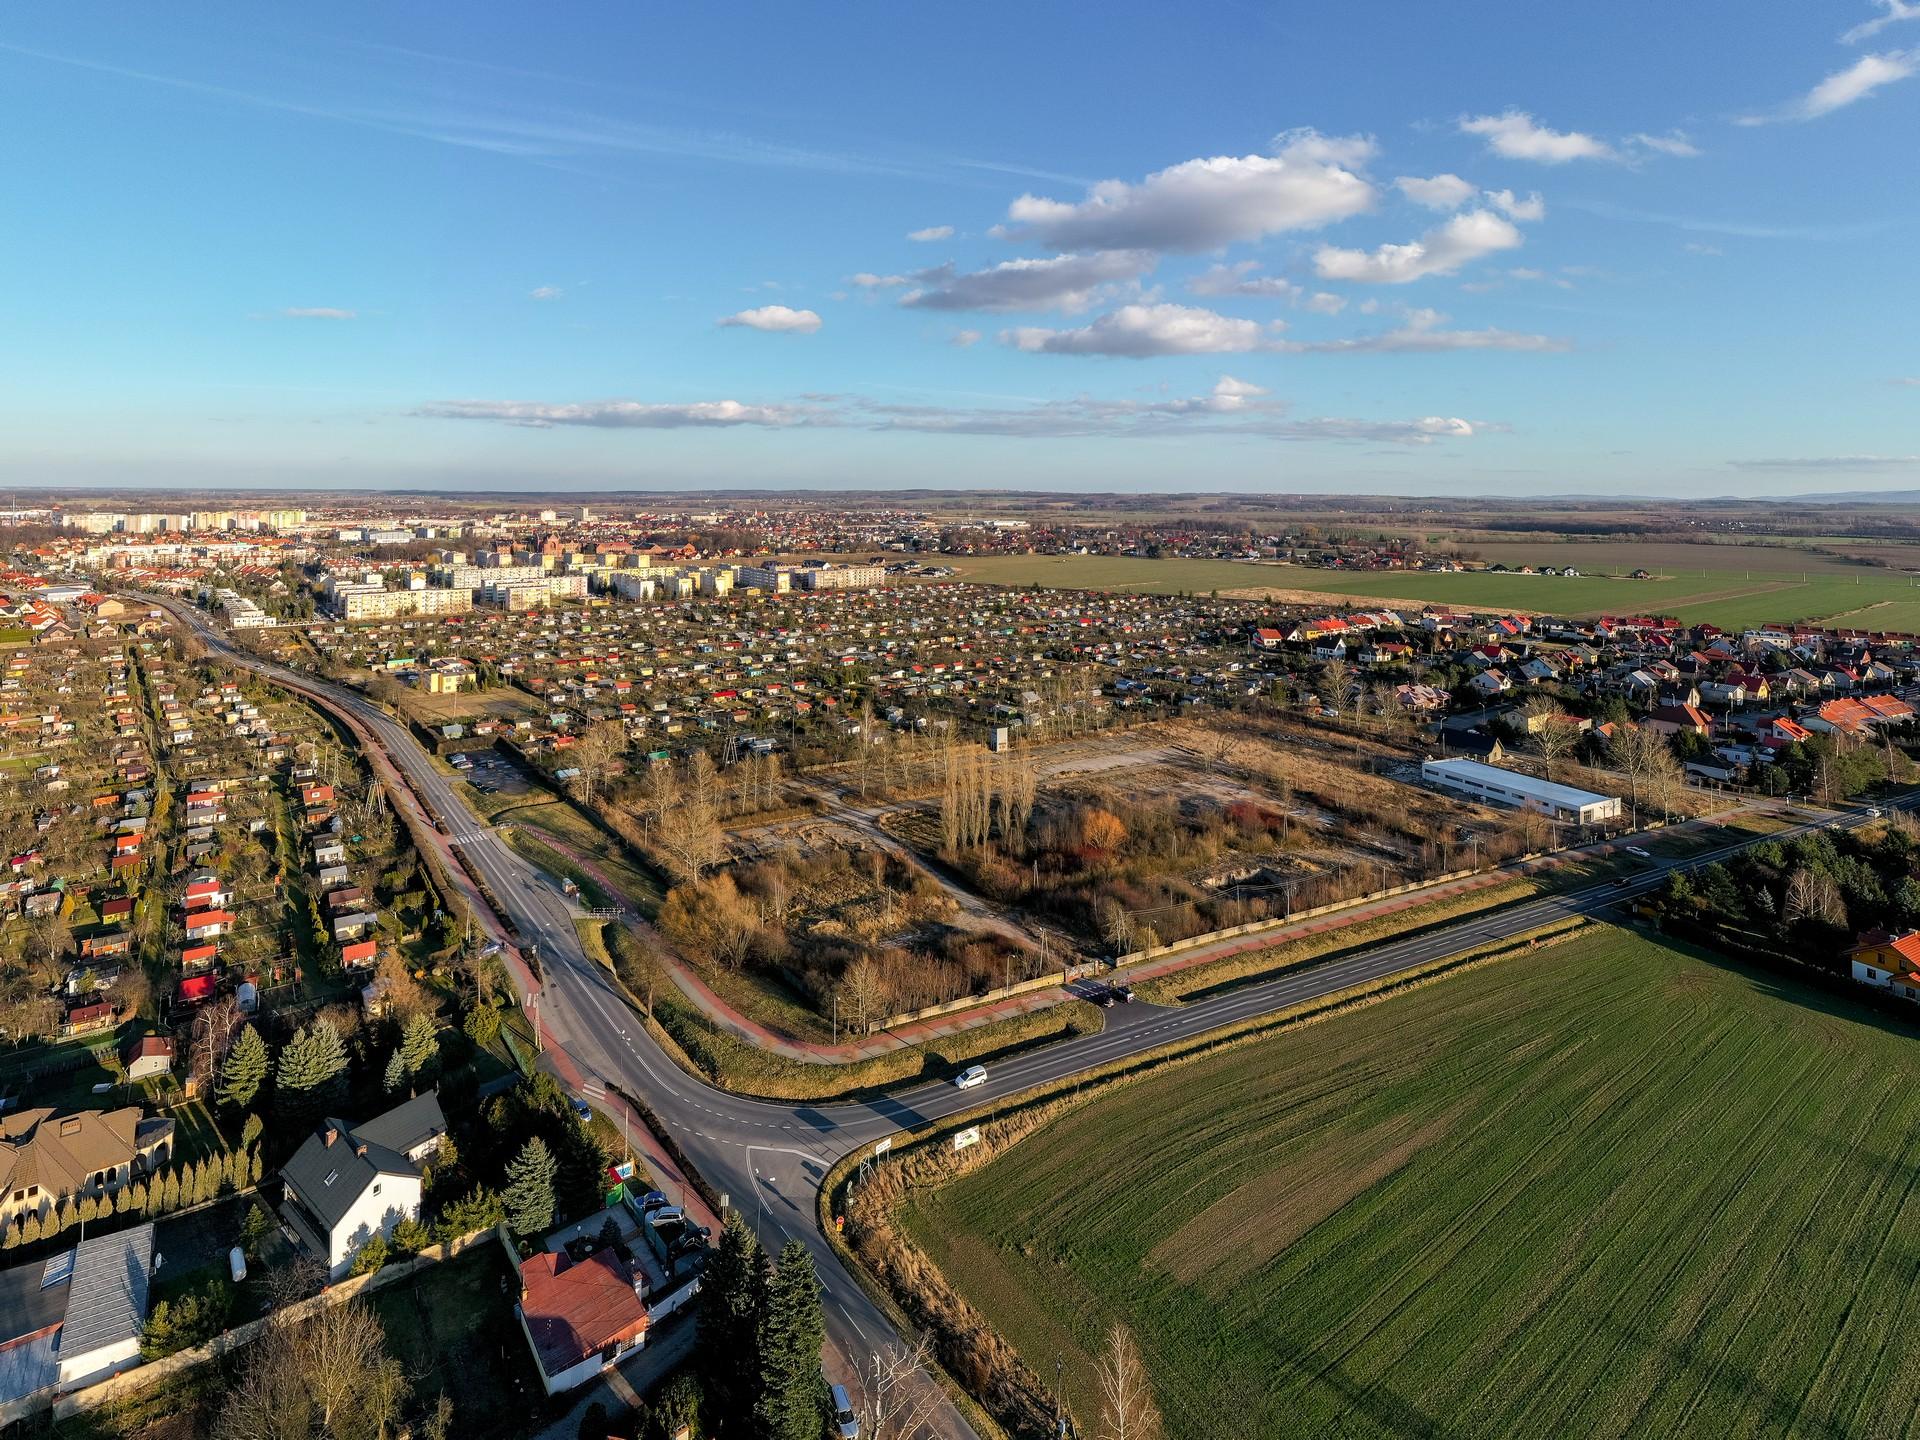 Belweder Park Nysa Zdjecia z Drona 20.02.2020 2